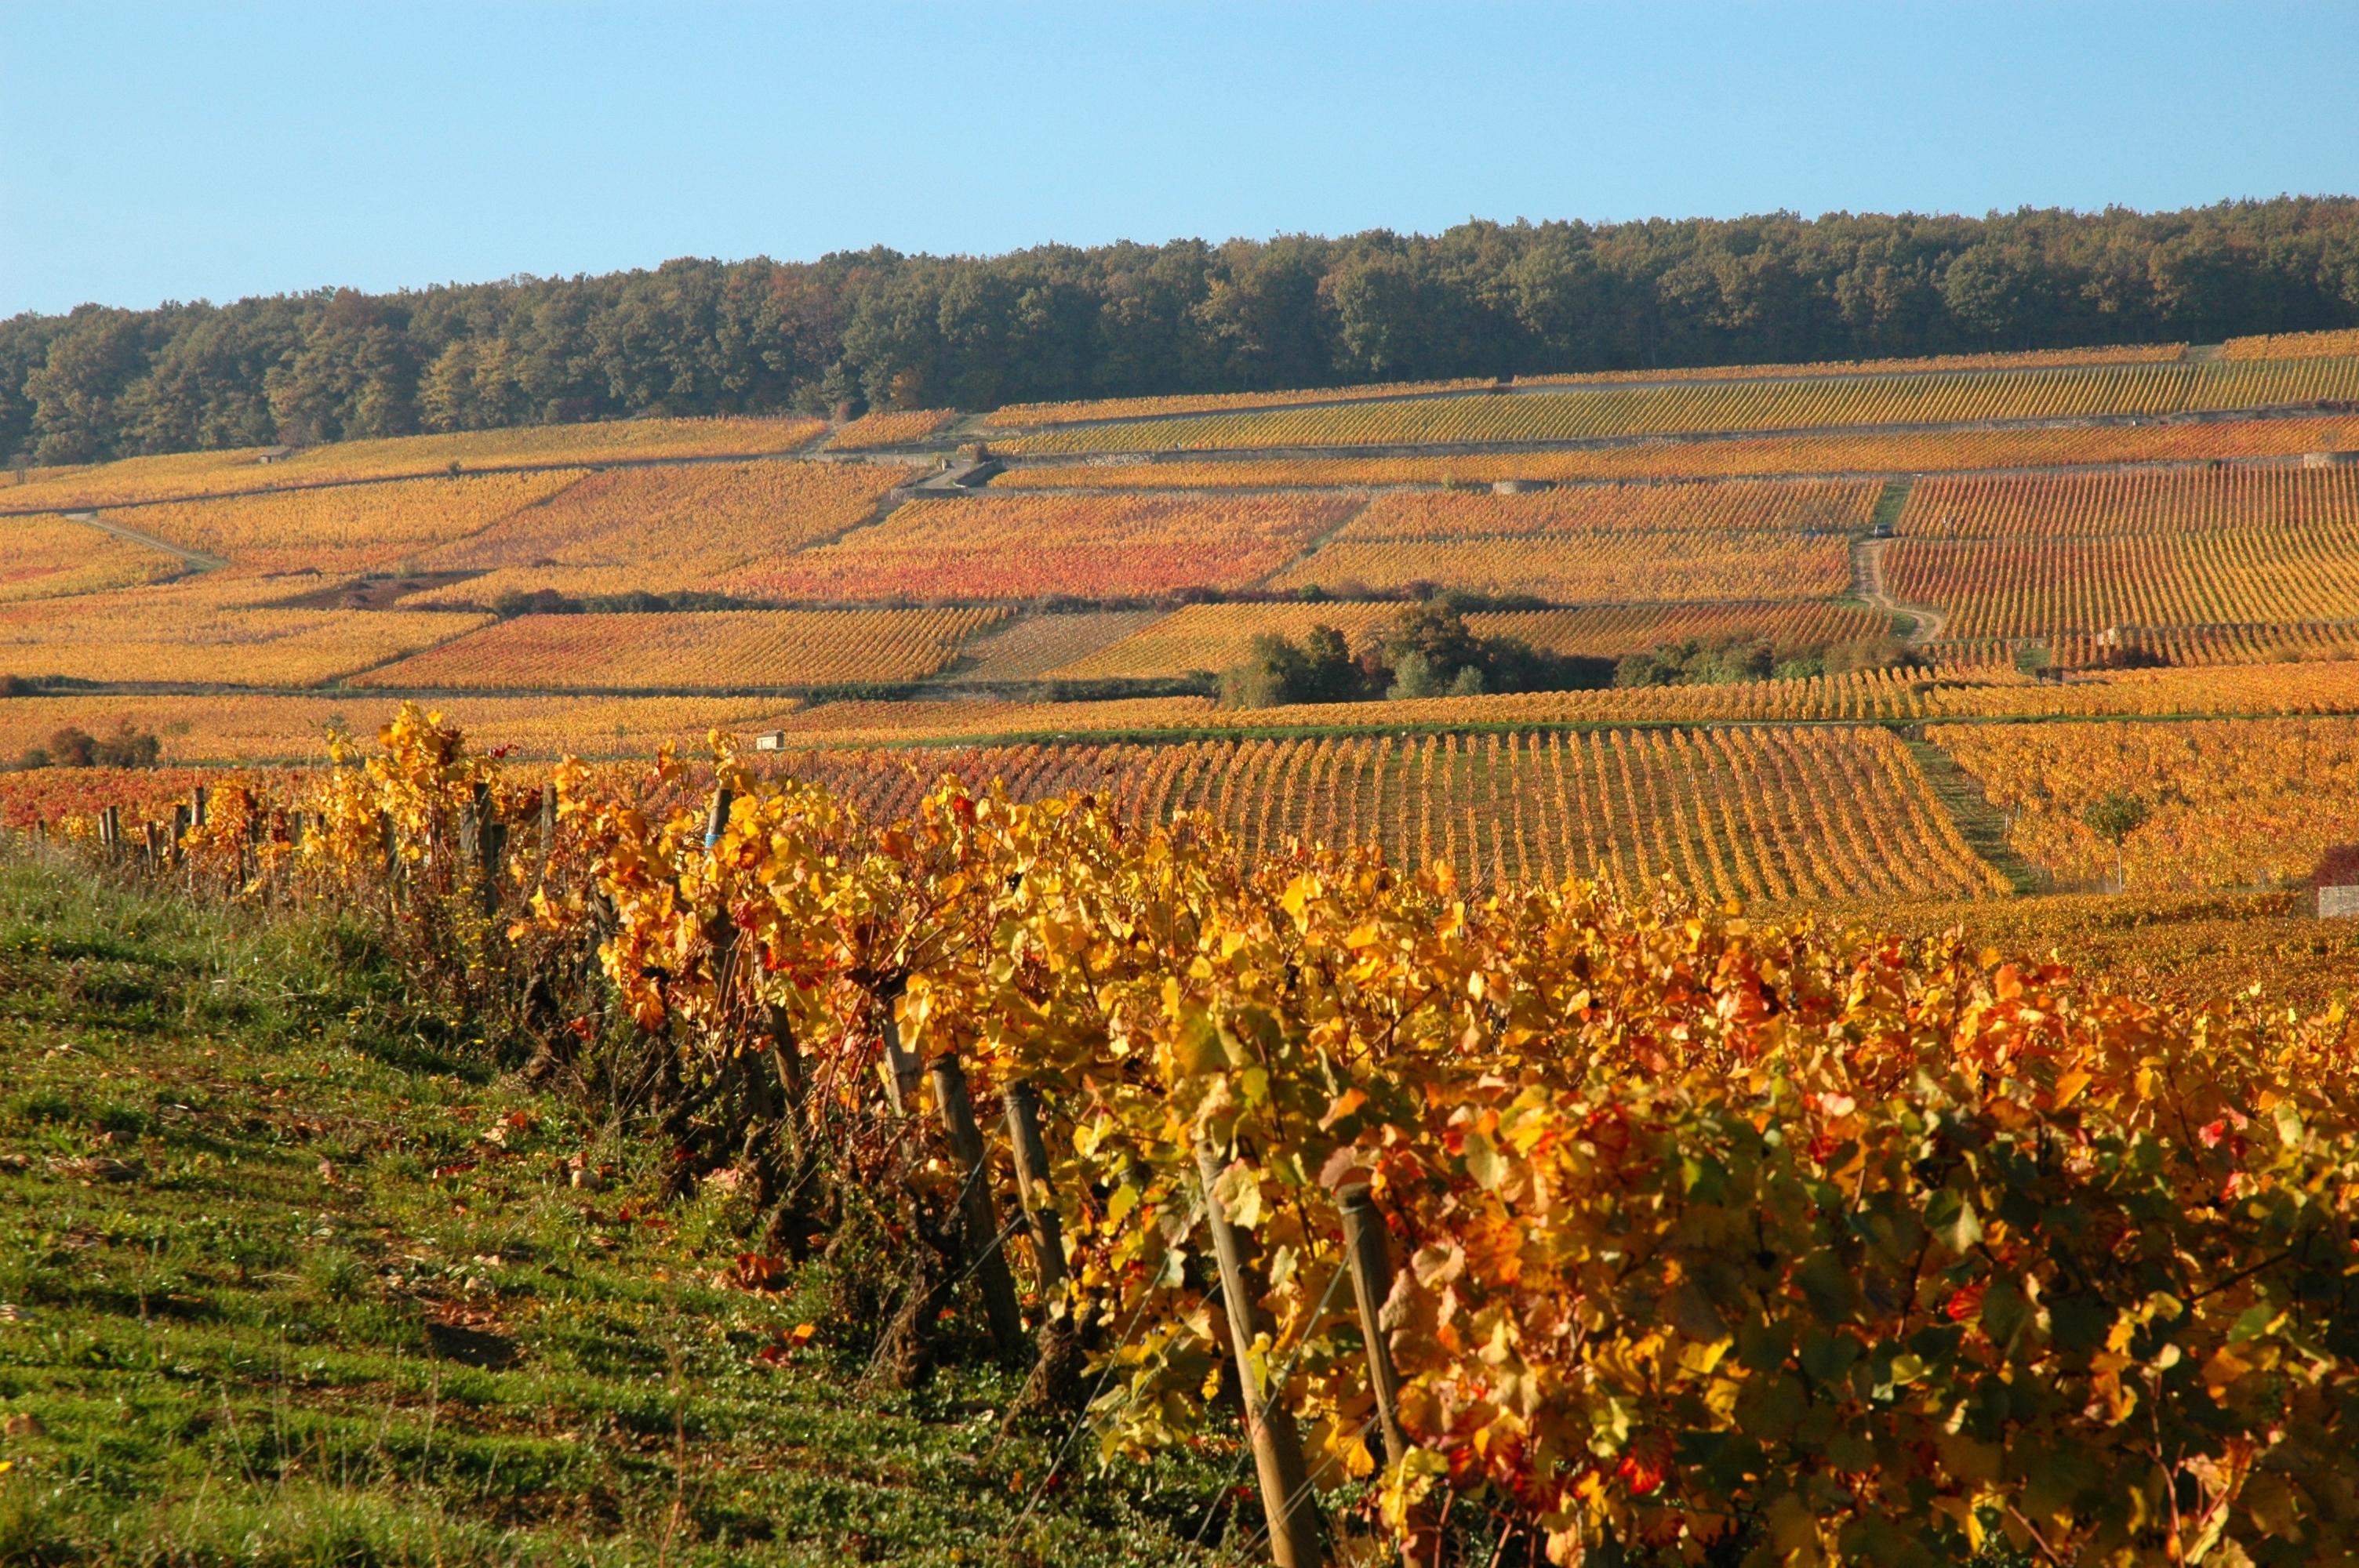 Vignes de Corton proches des Chambres Buissonnieres Ladoix Serrigny route des grands crus (2)